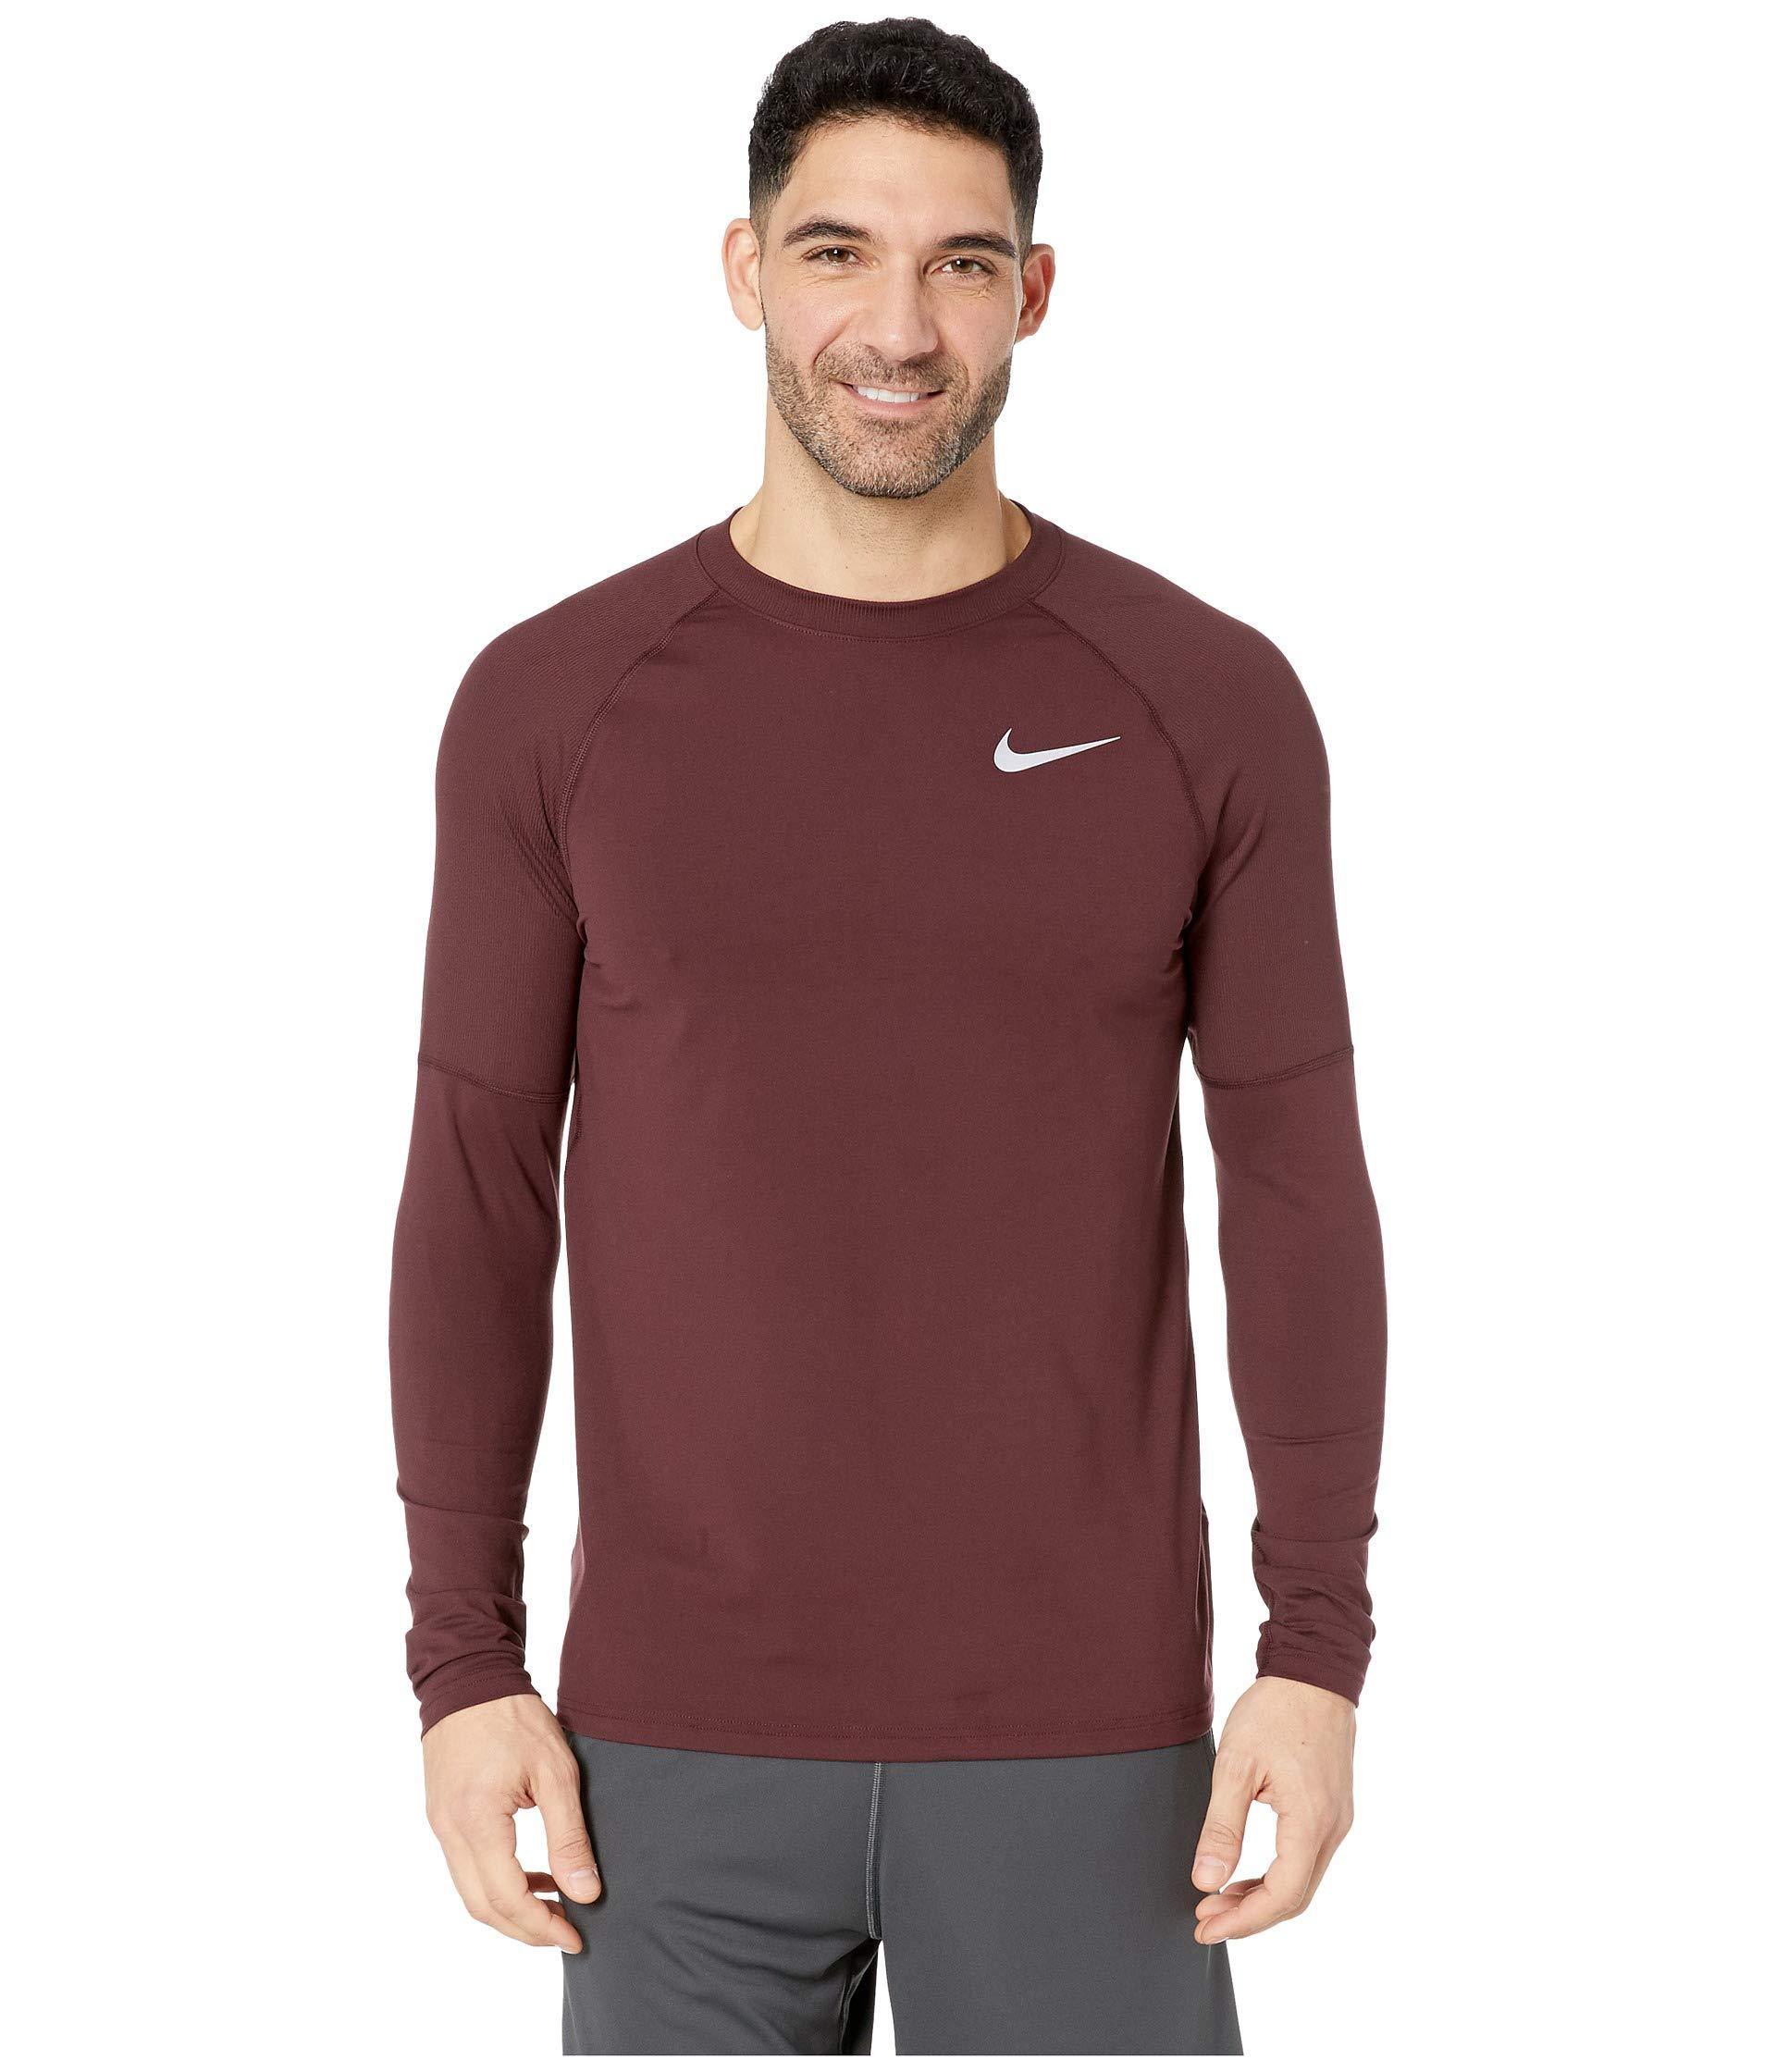 Nike Men's Element Crew Running Long Sleeve Tee (Burgundy Crush, XX-Large)